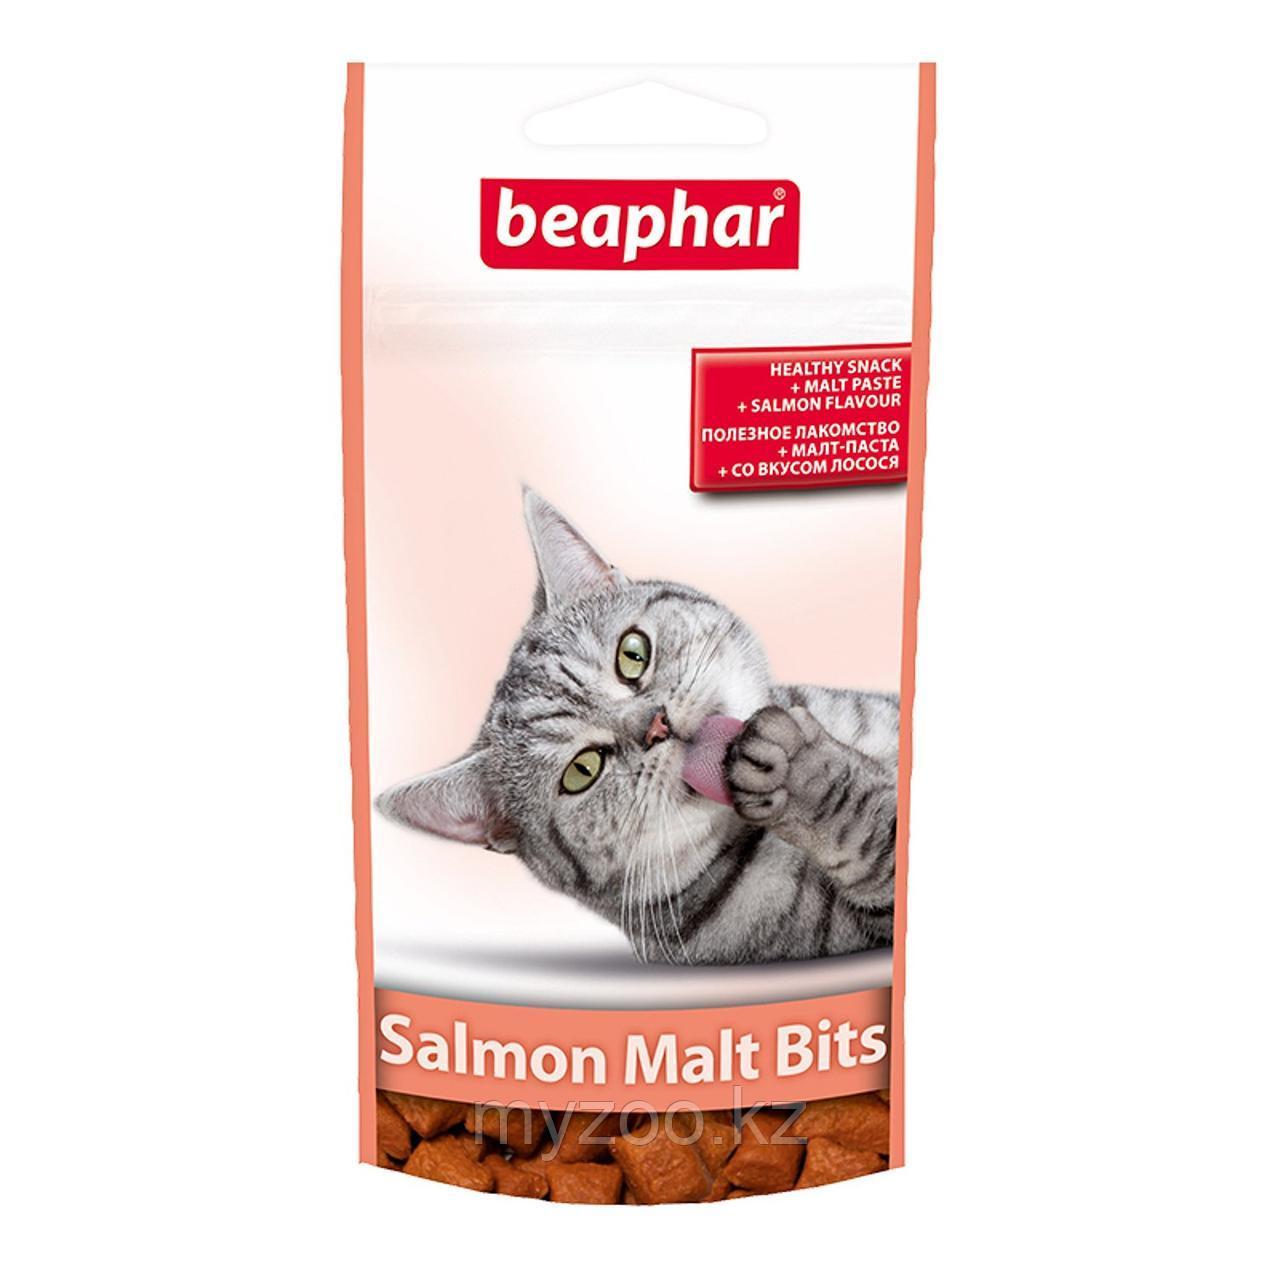 Beaphar Malt Bits Salmon, Беафар Подушечки для вывода шерсти у кошек со вкусом ЛОСОСЯ , 35гр.